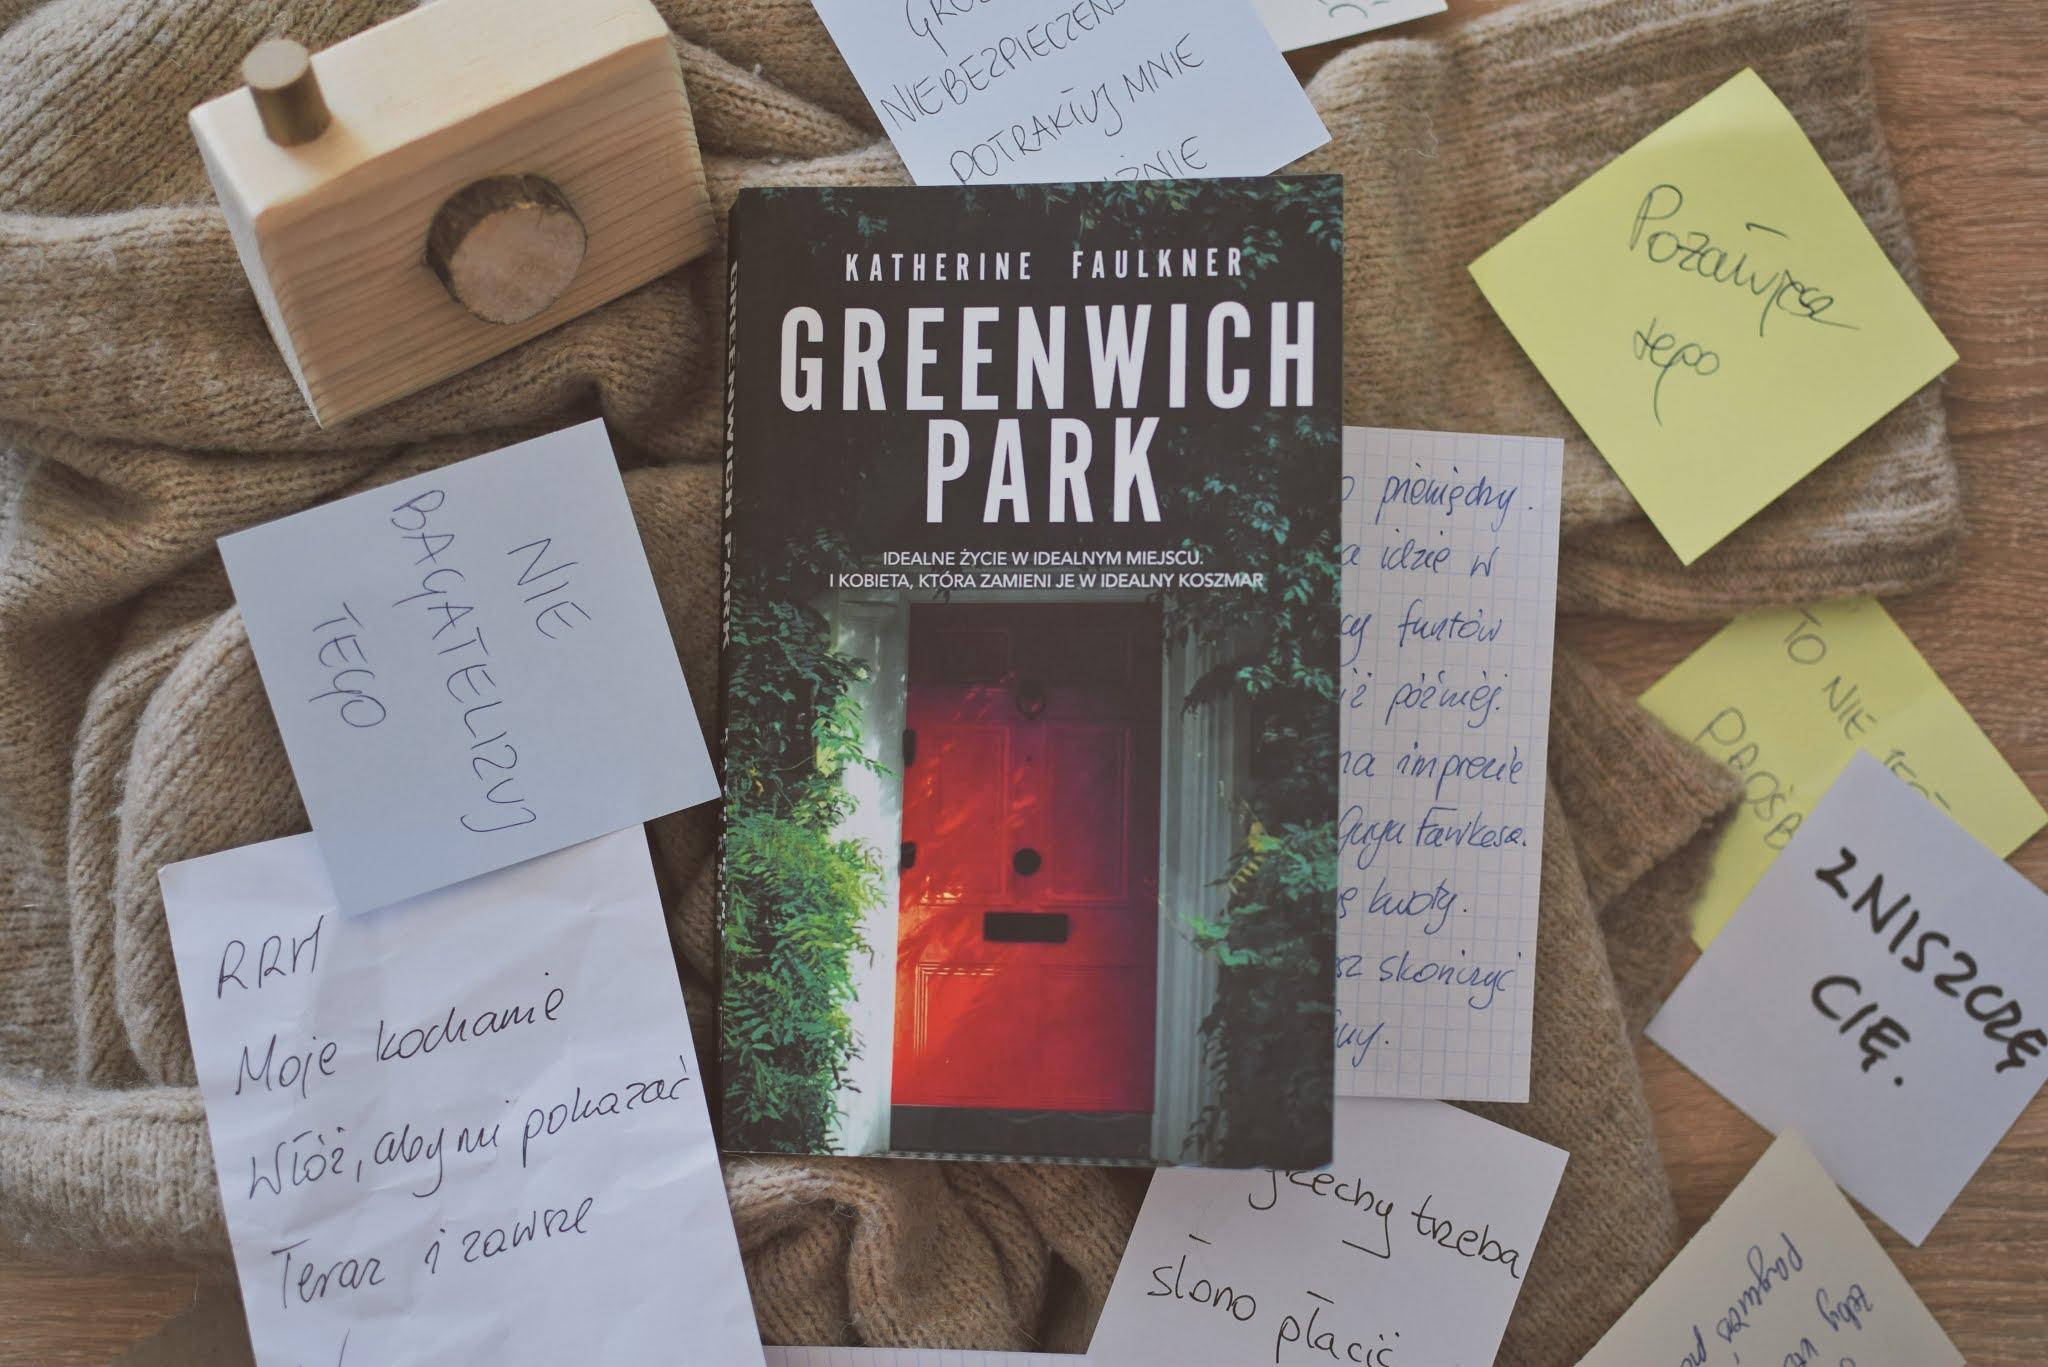 Greenwich%2BPark%2BKatherine%2BFaulkner%